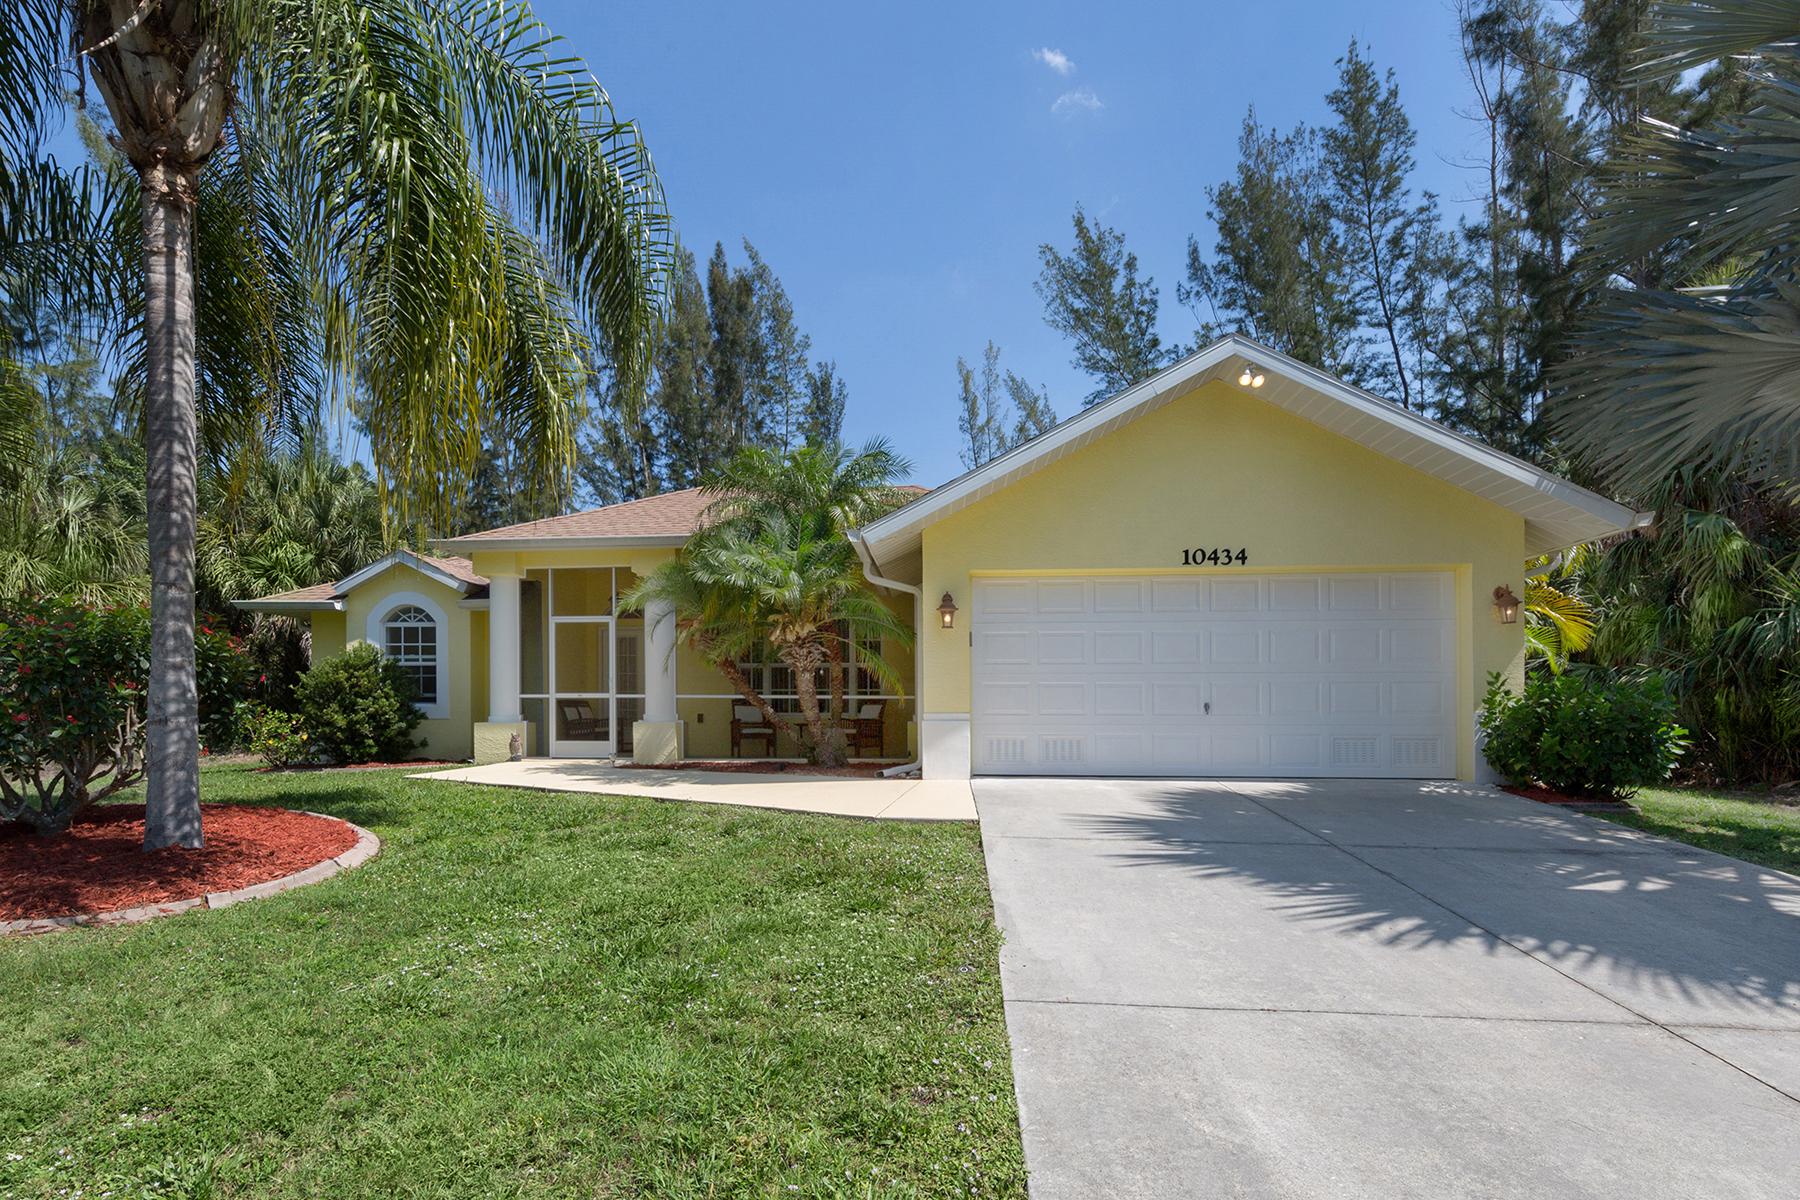 Vivienda unifamiliar por un Venta en PORT CHARLOTTE 10434 Sarasota Rd Port Charlotte, Florida 33981 Estados Unidos